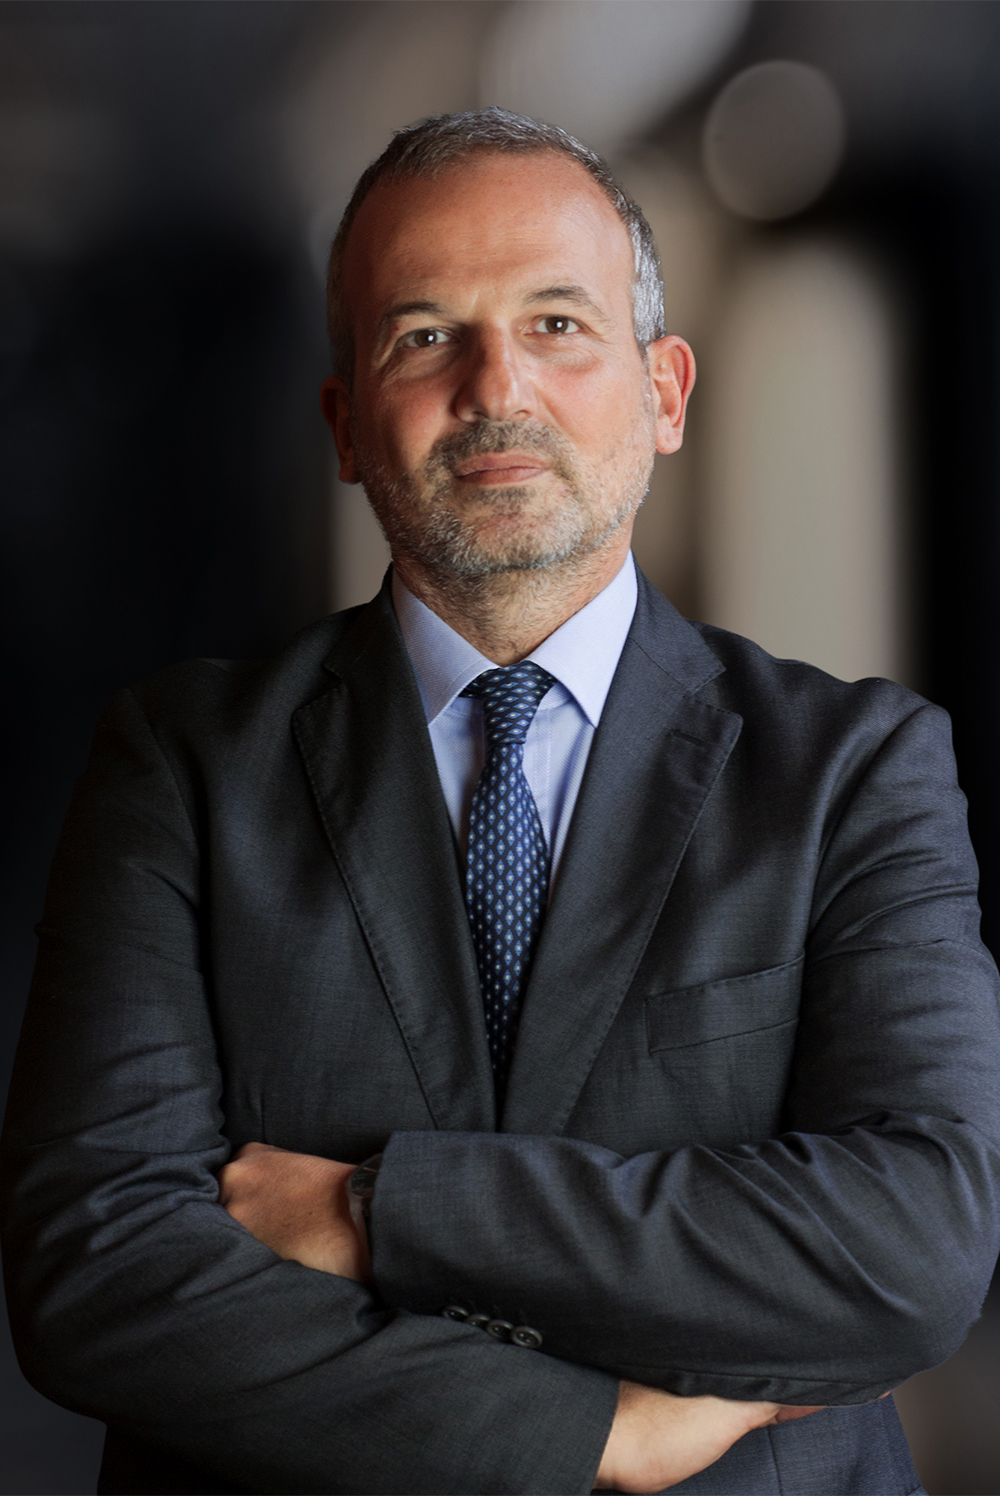 Gianmatteo Nunziante